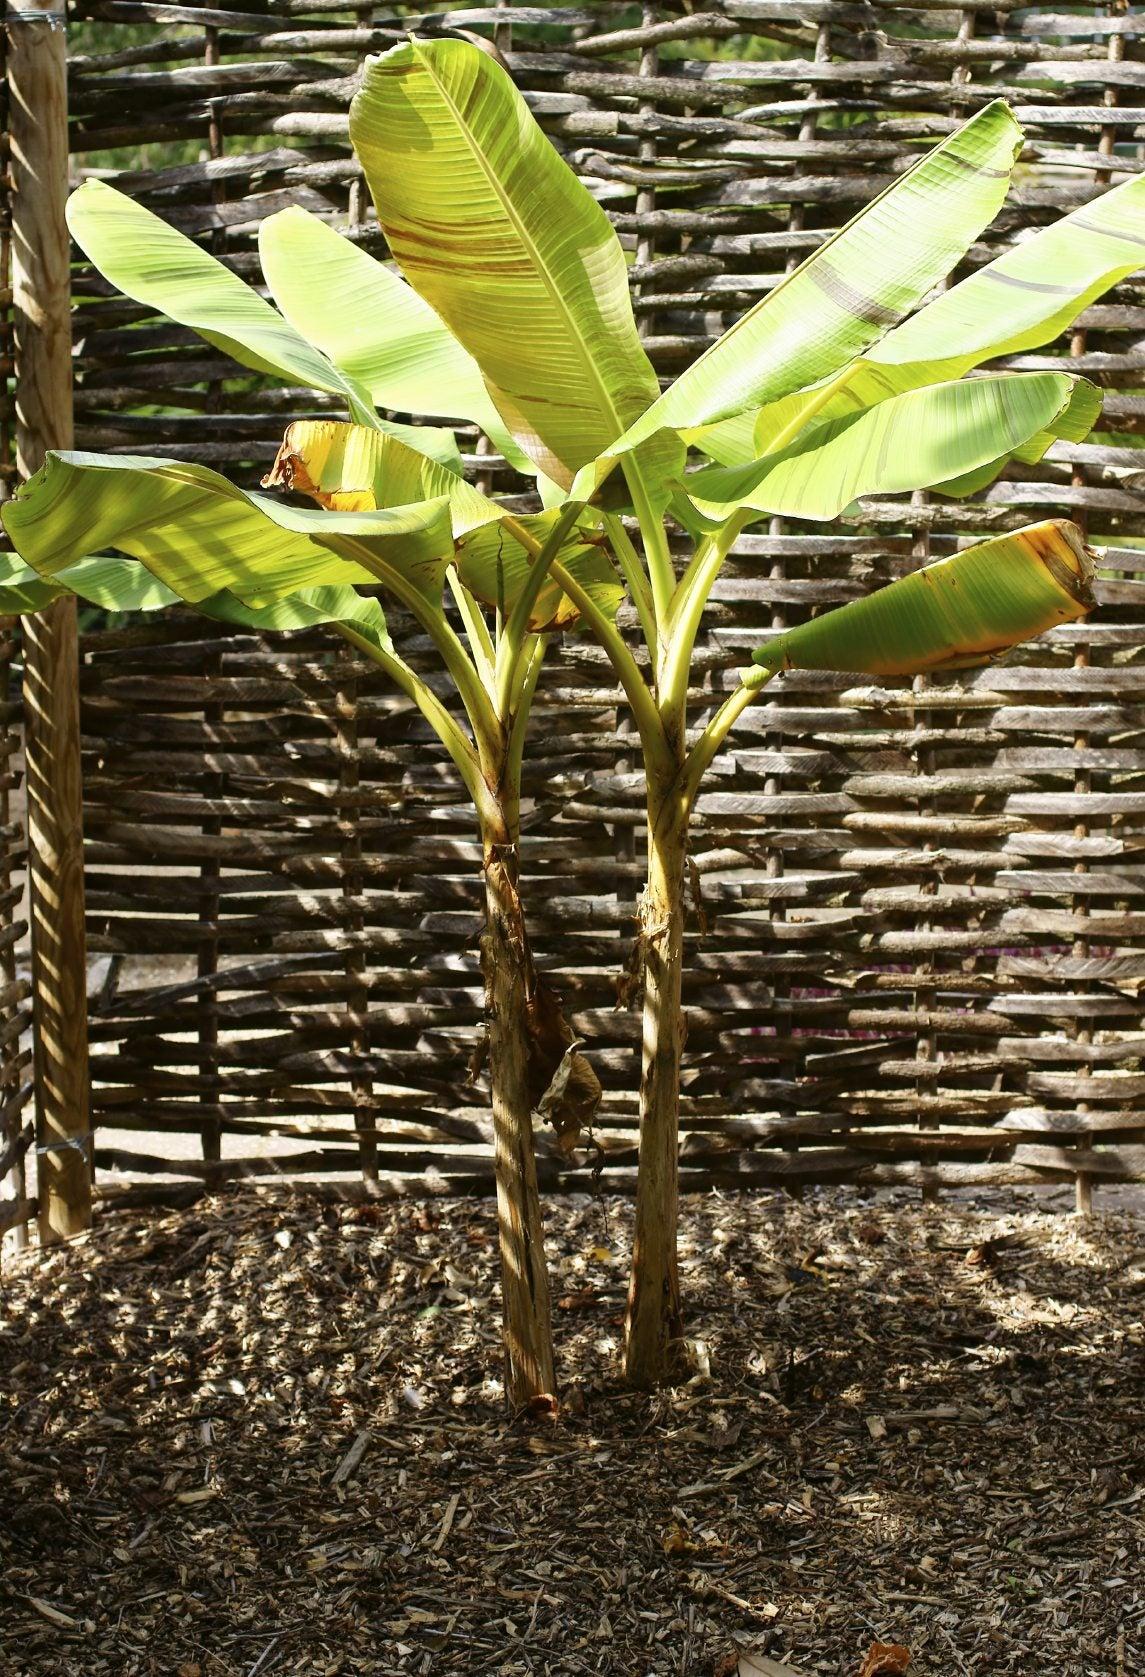 Splitting A Banana Plant - Separating Banana Plants For Propagation